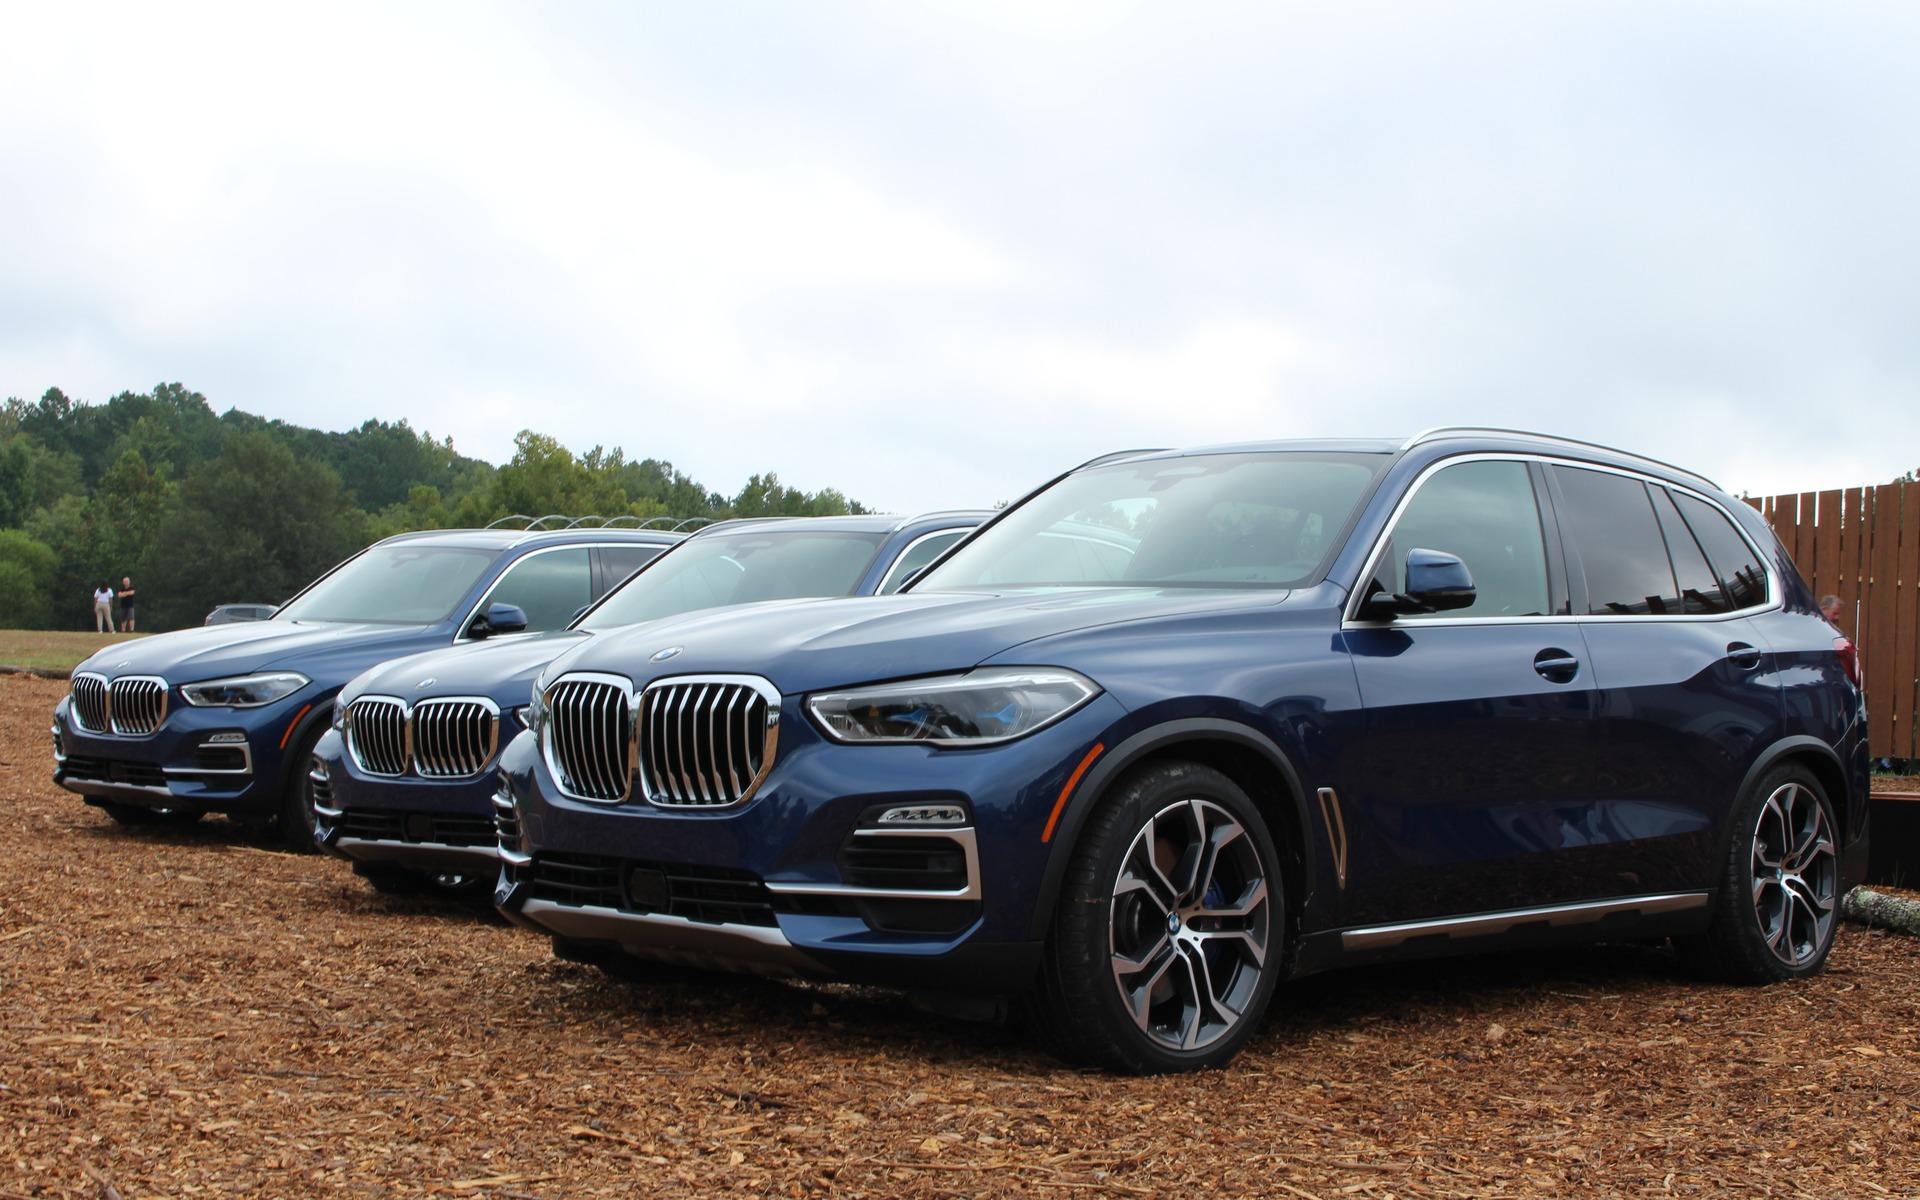 BMW X5 2019 : évolution technologique 349937_2019_BMW_X5